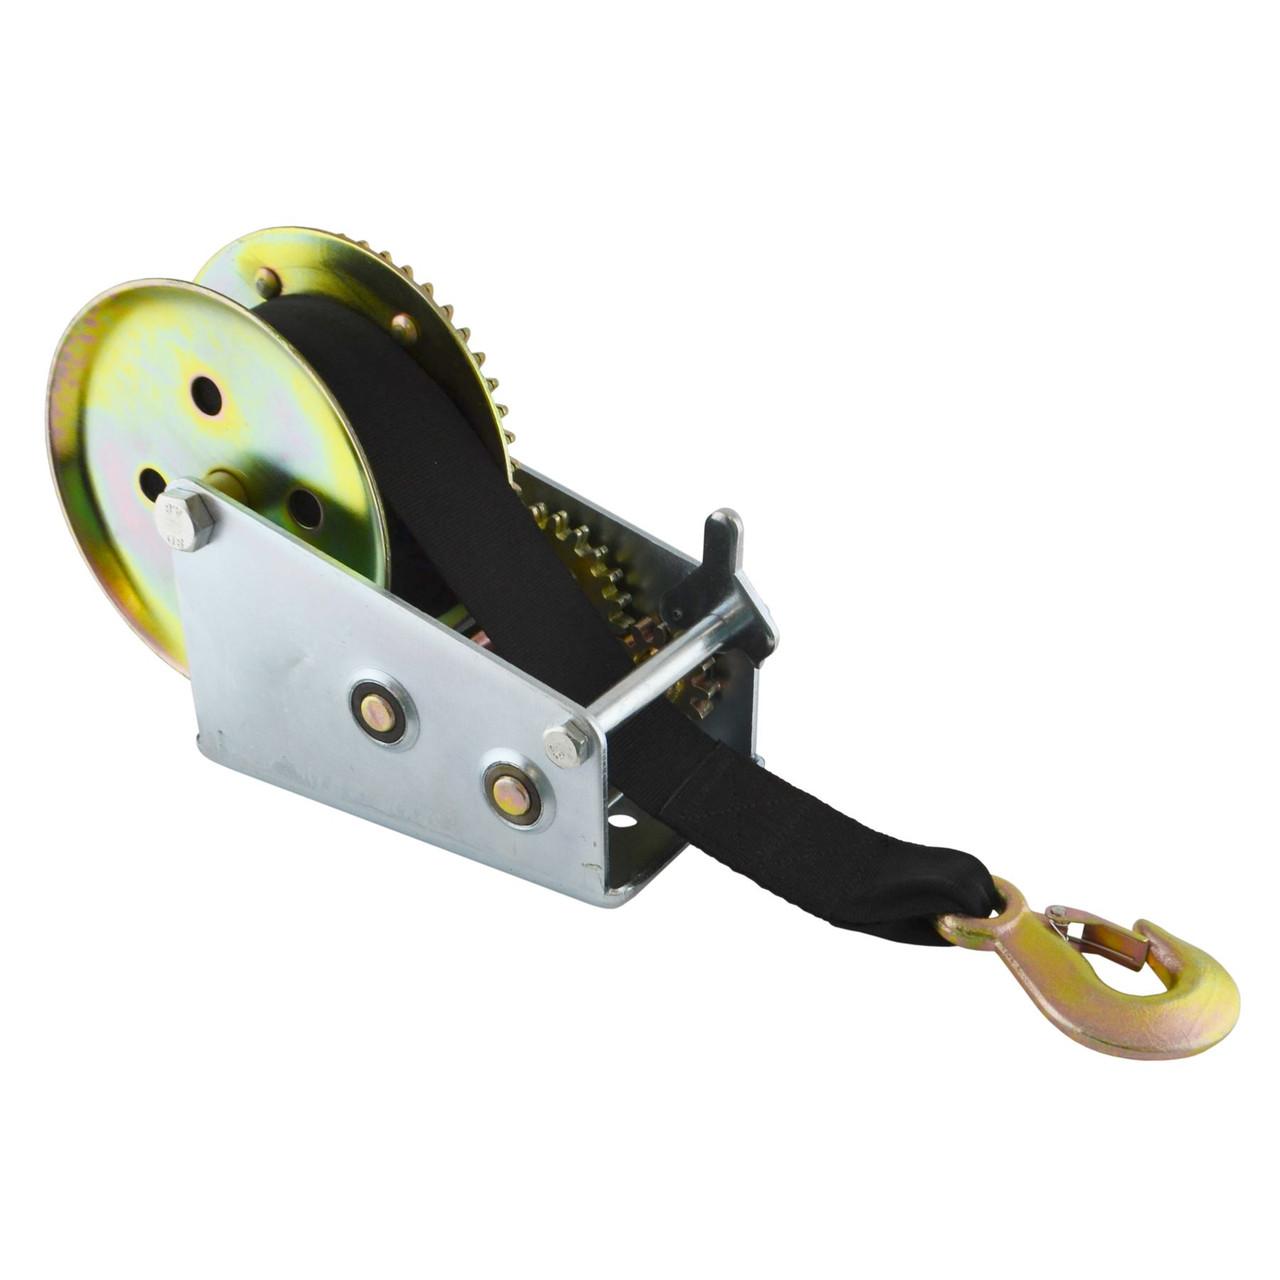 2000LB Hand Strap Winch Boat Caravan Trailer Marine Puller Hoist Gear TE826